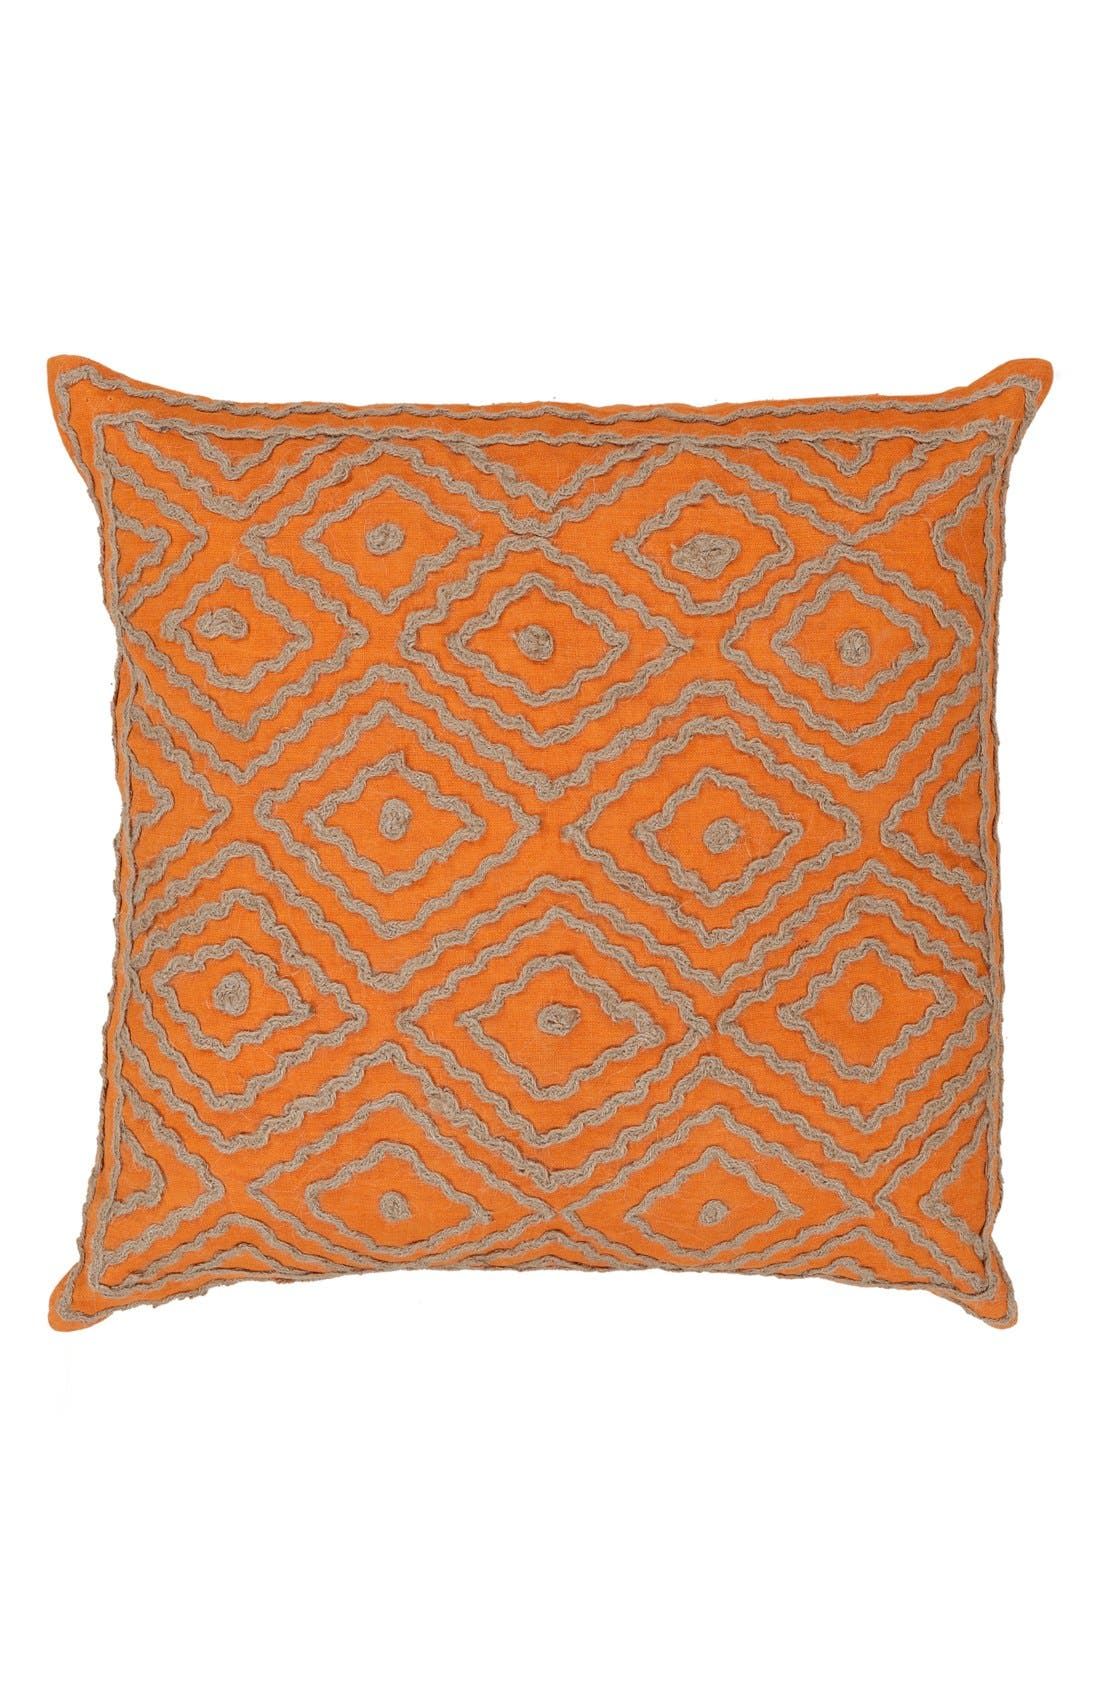 Surya Home 'Atlas' Pillow